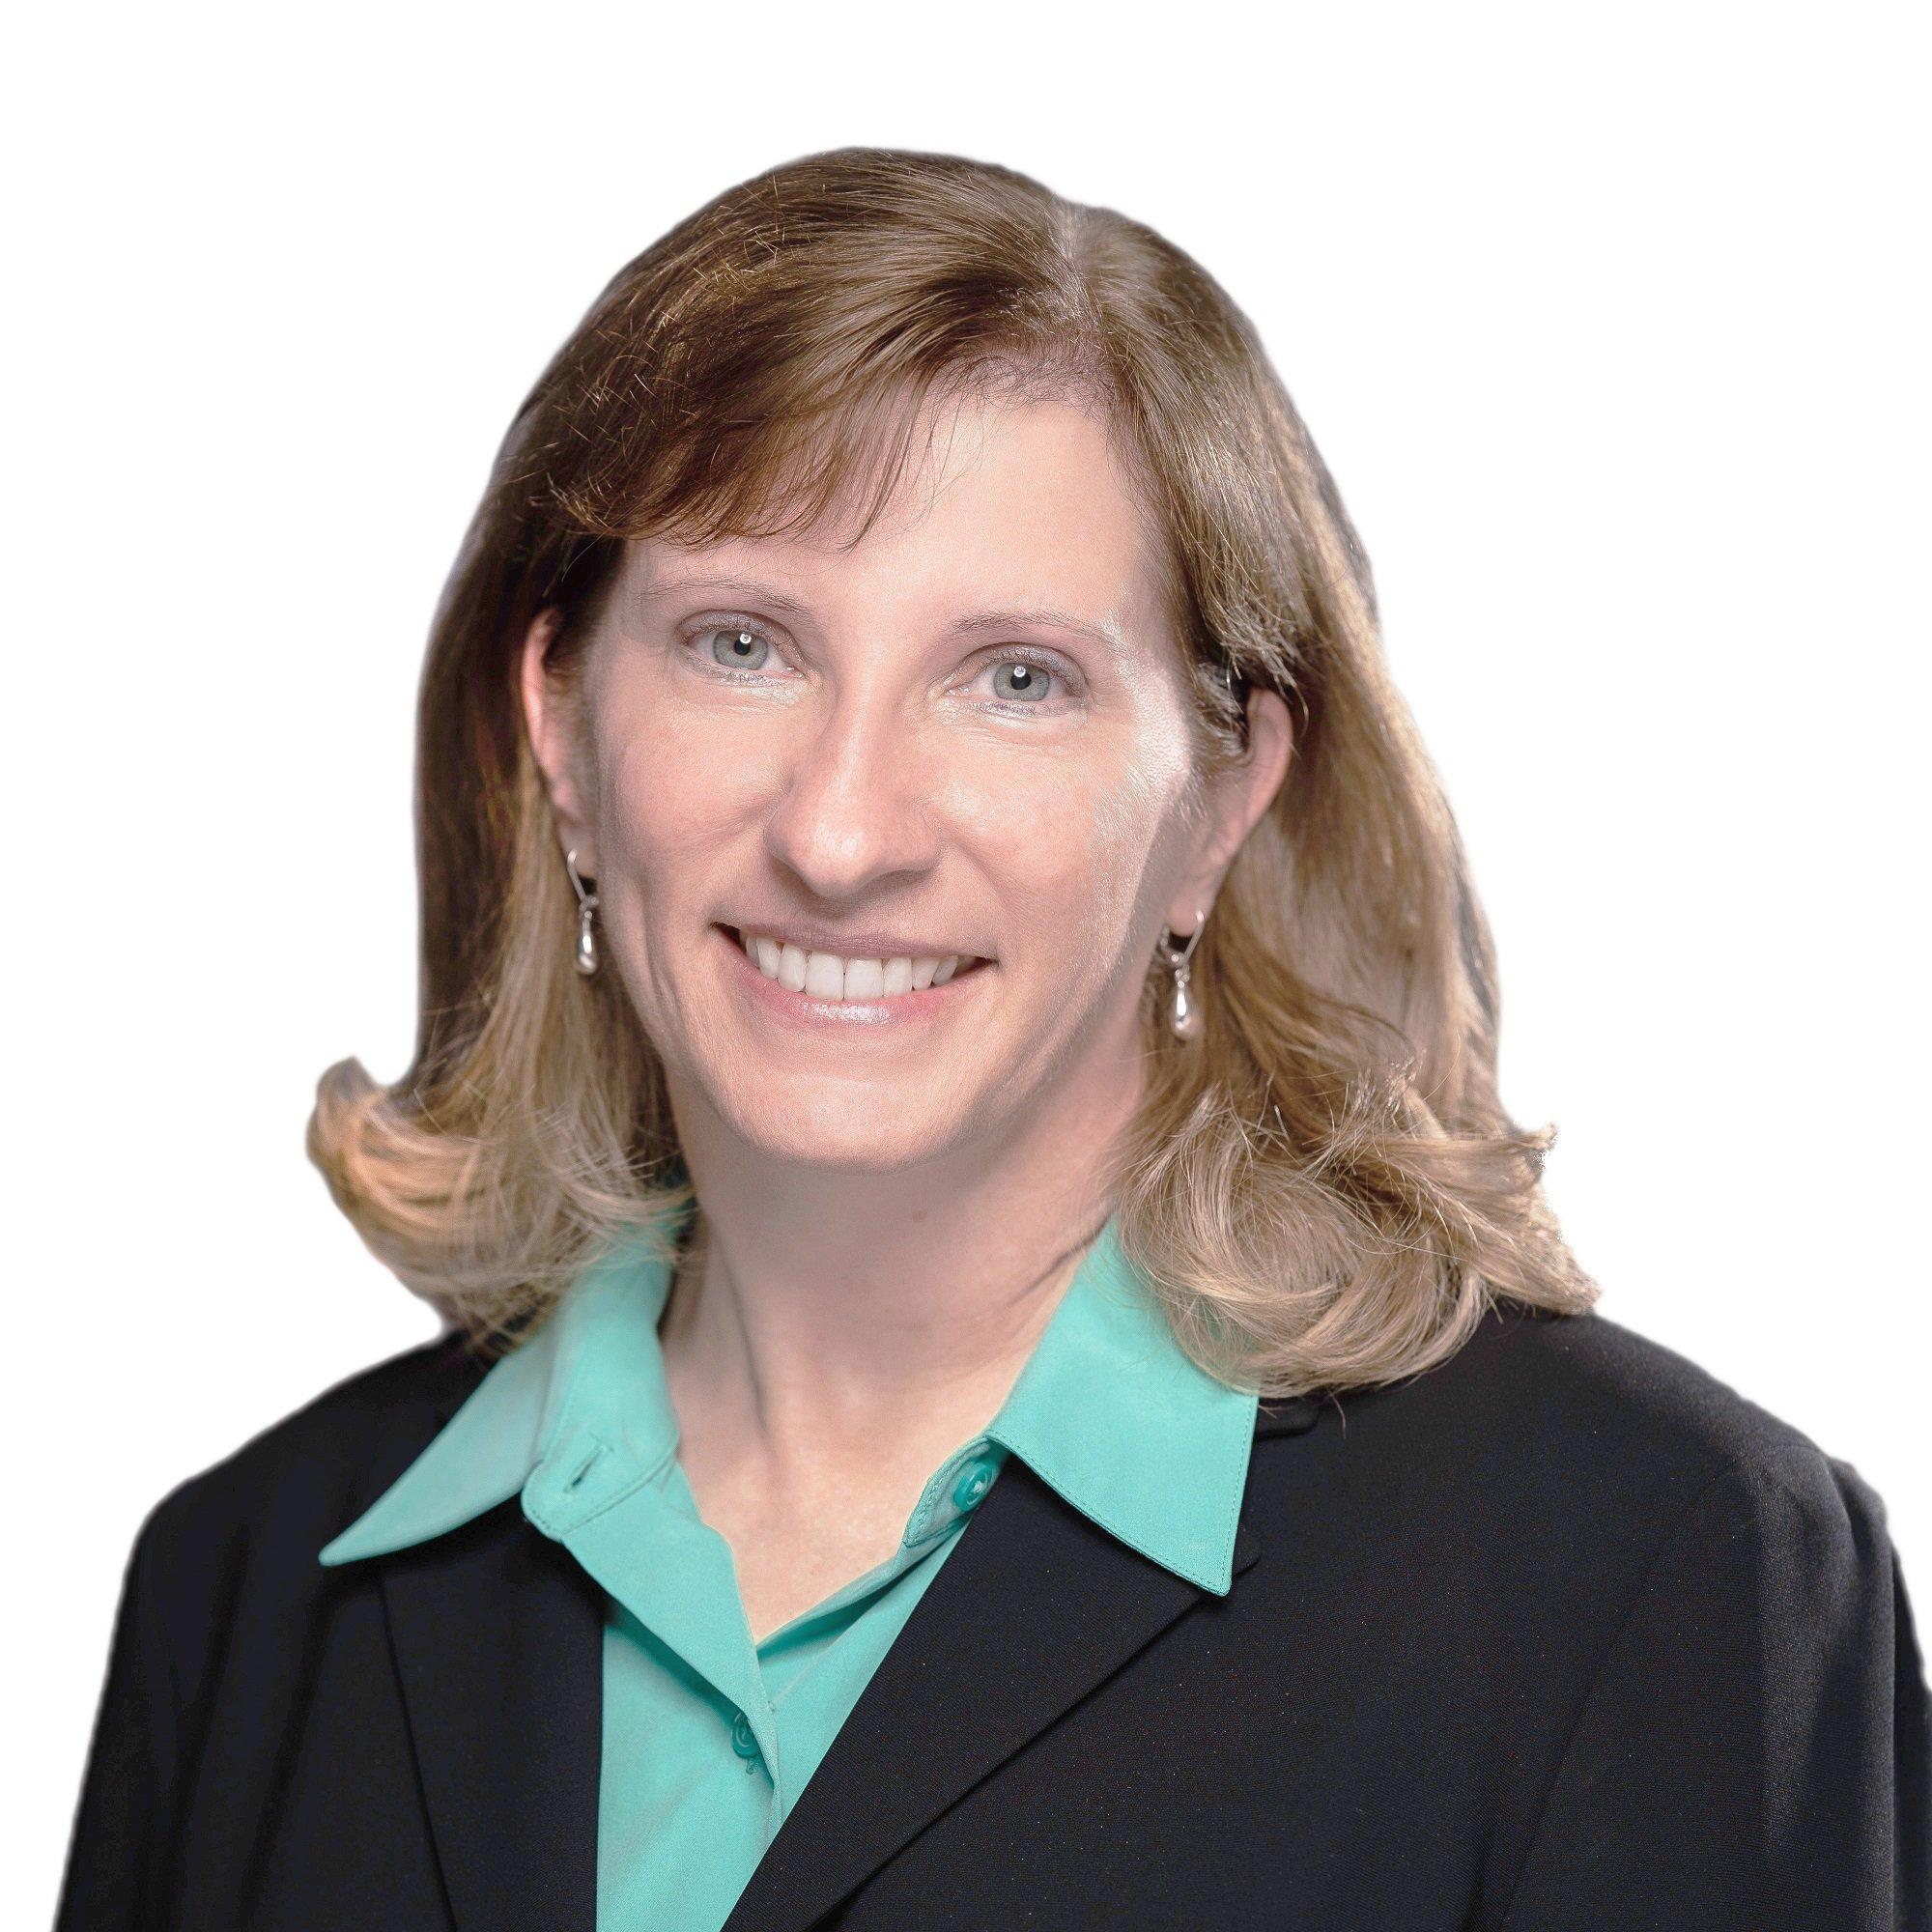 Maggie Pabustan